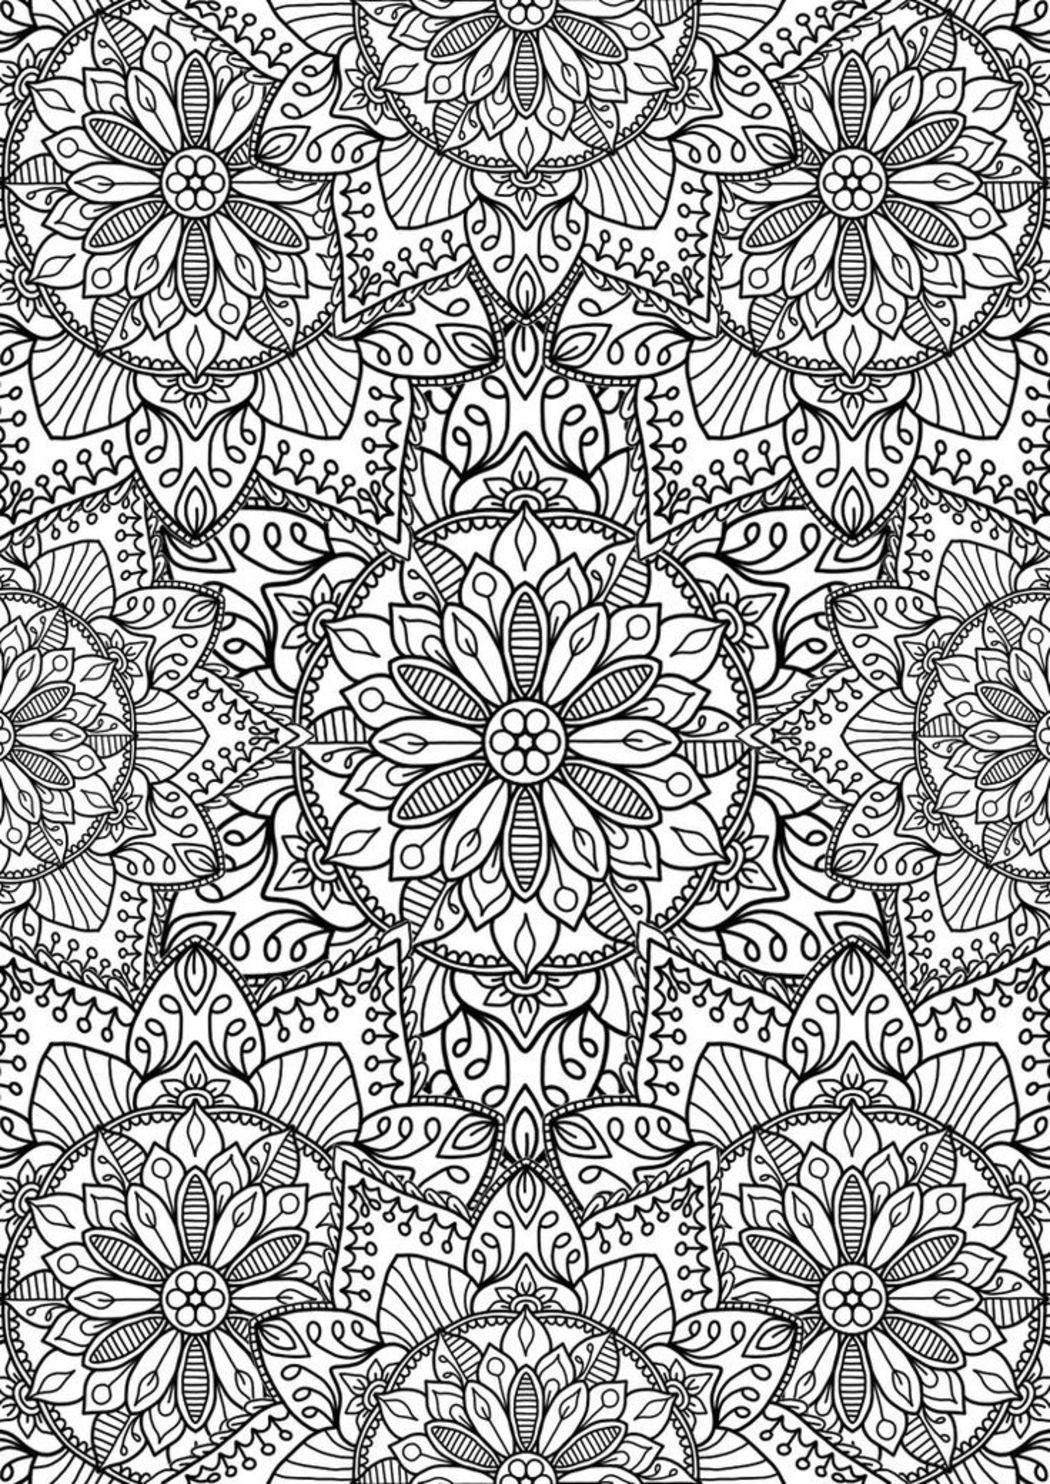 Mandala disegno 3846